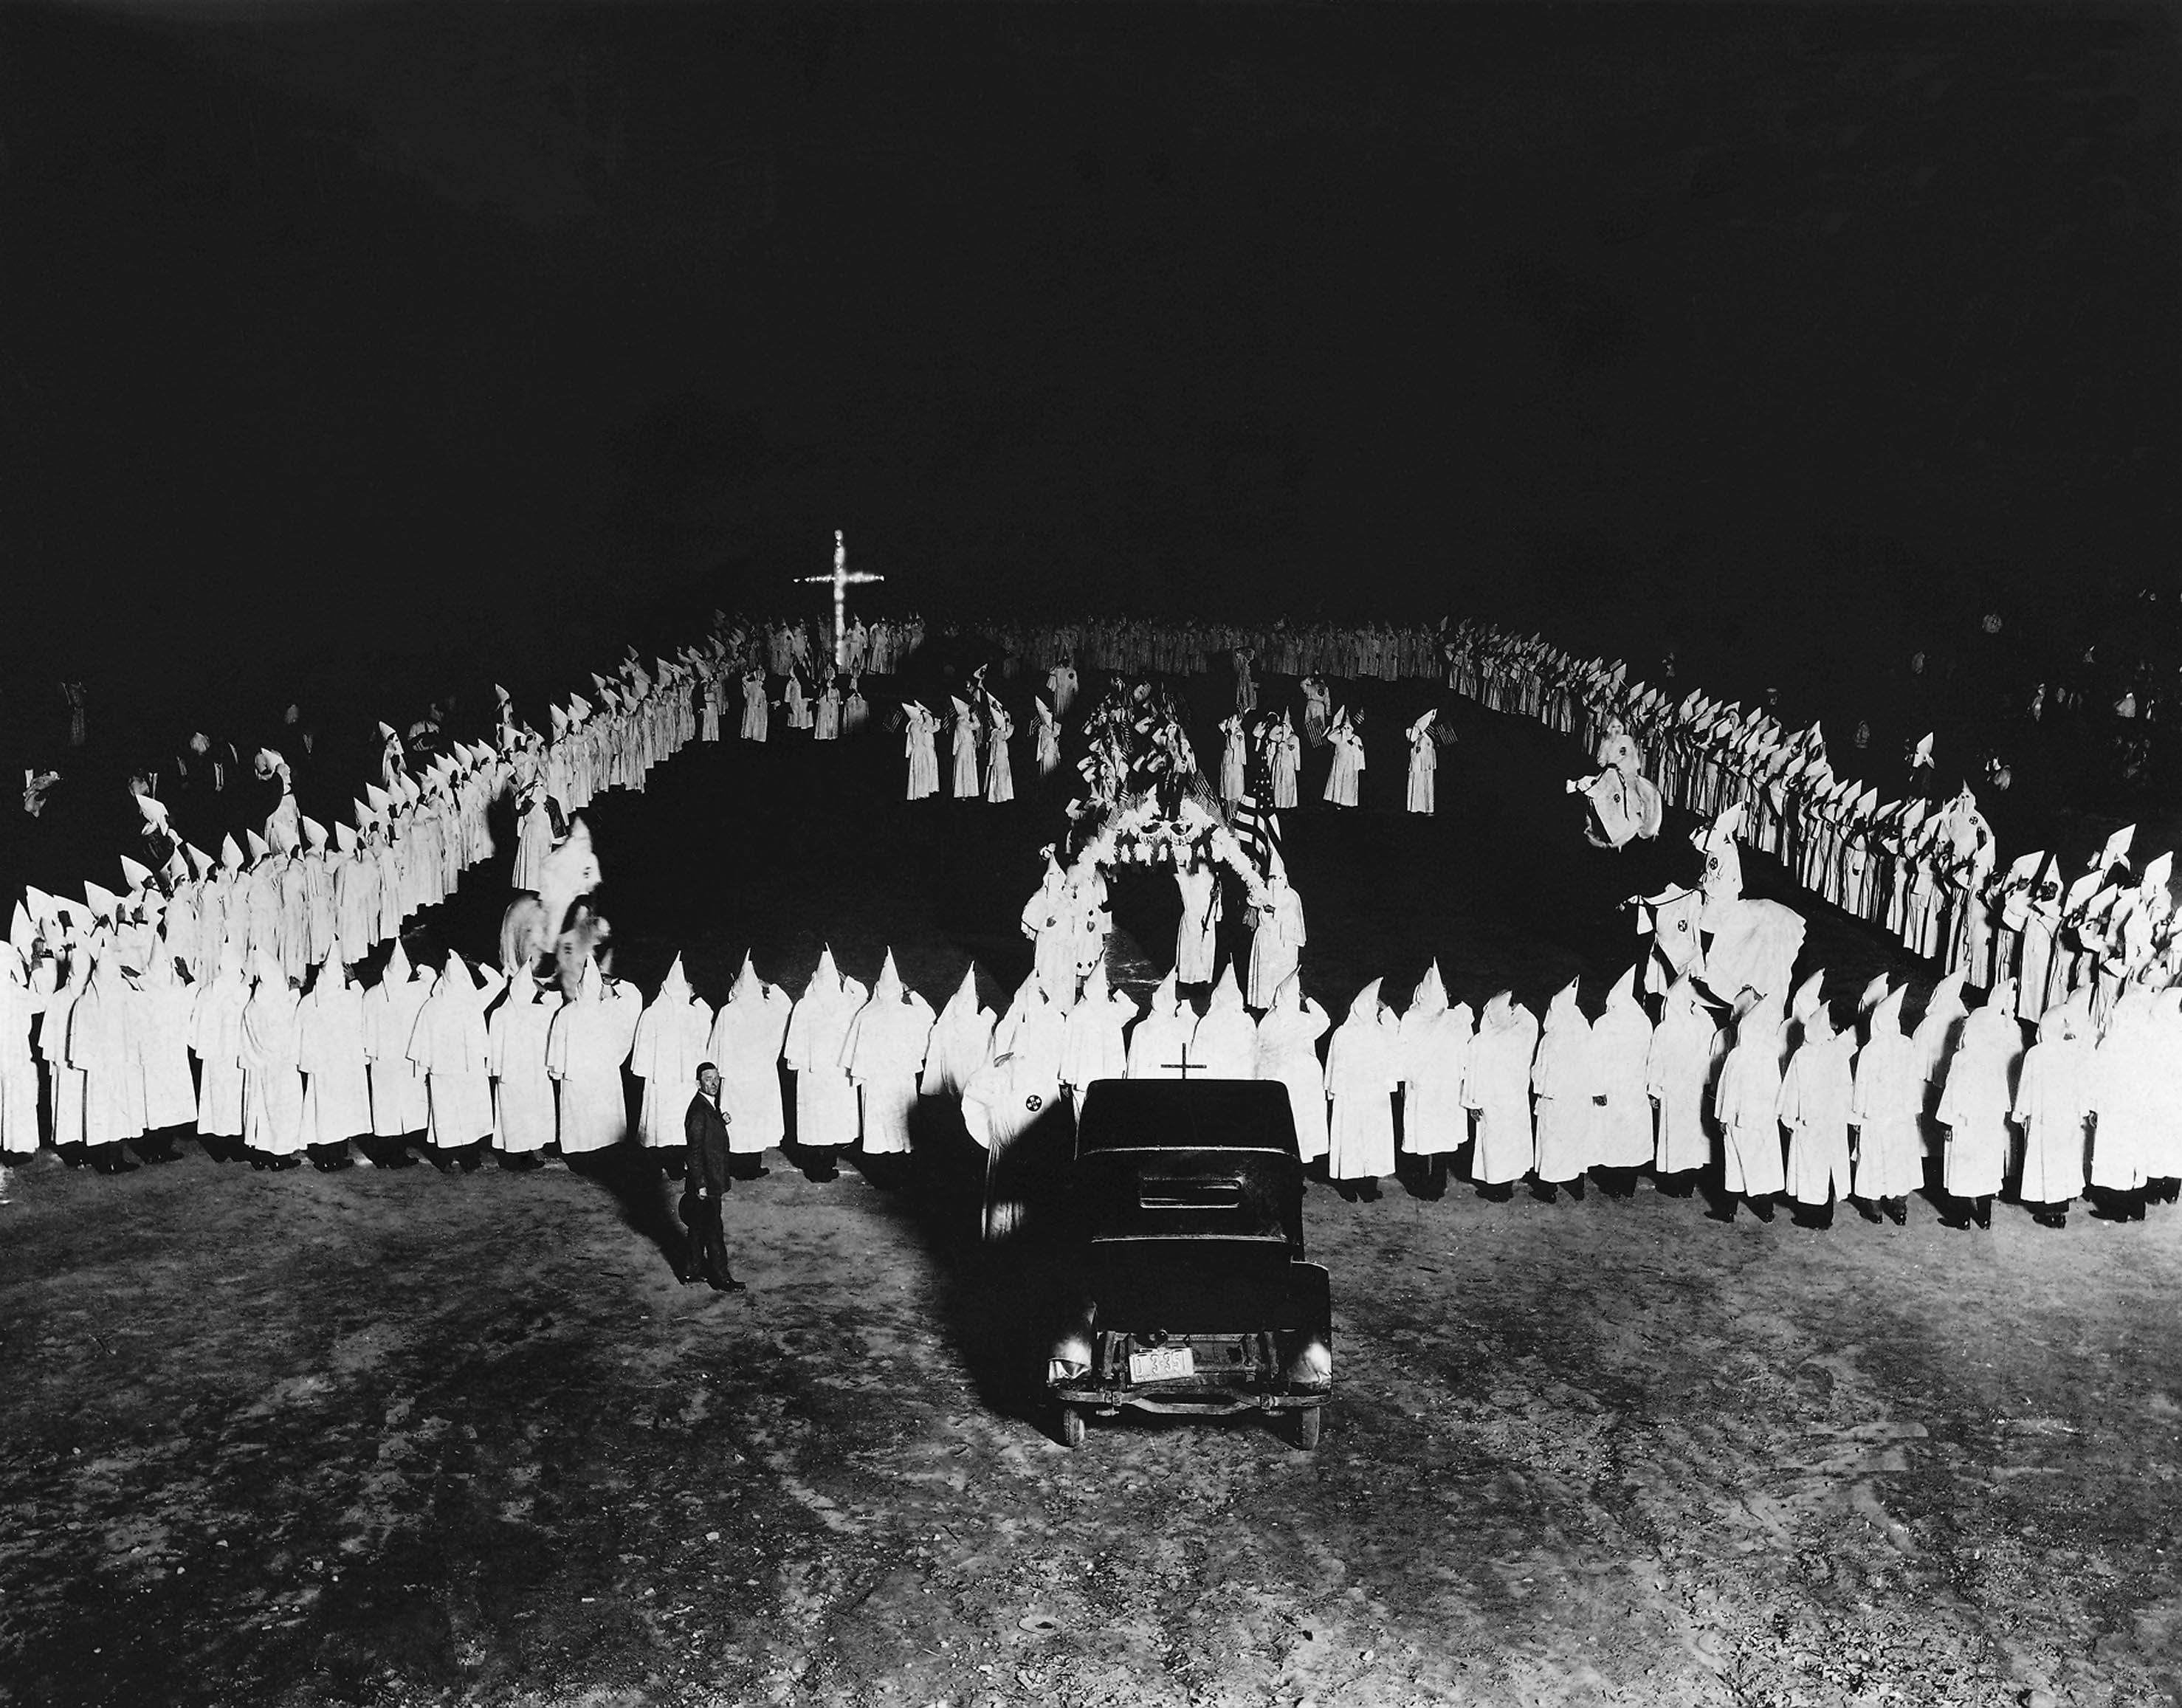 Ku Klux Klan ceremony